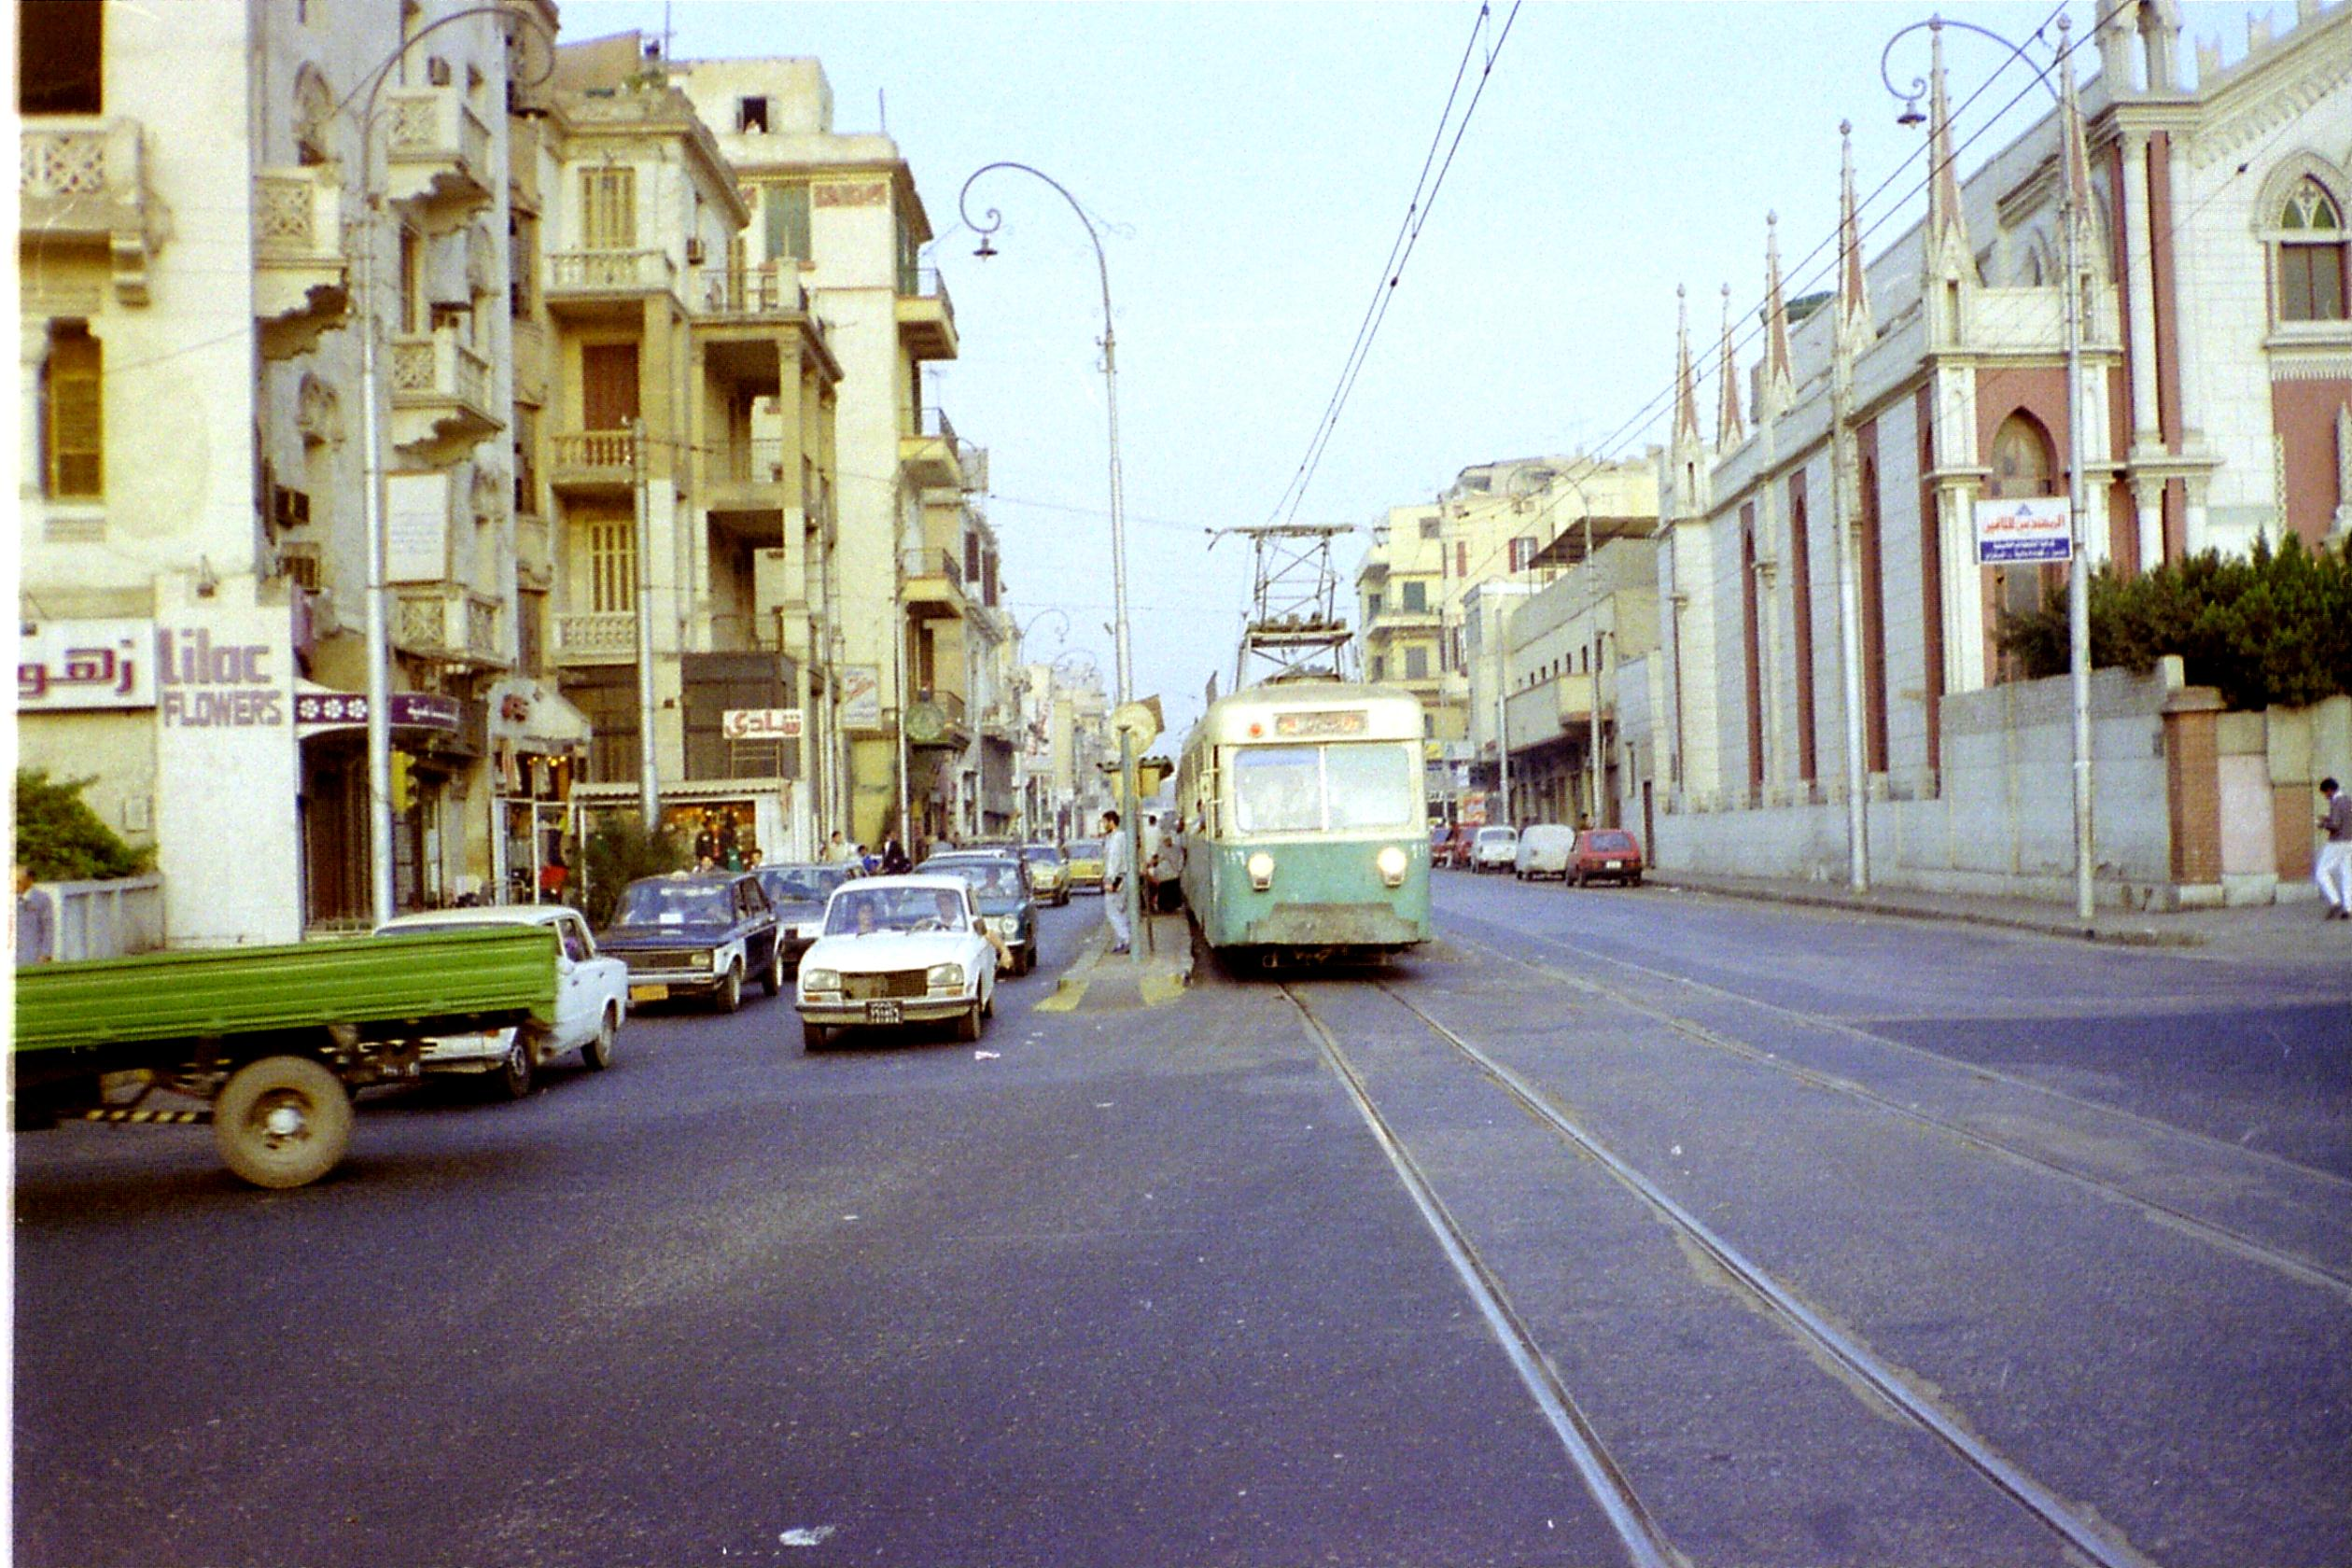 Heliopolis-Tram-Maronite-Church-We-Are-Railfans